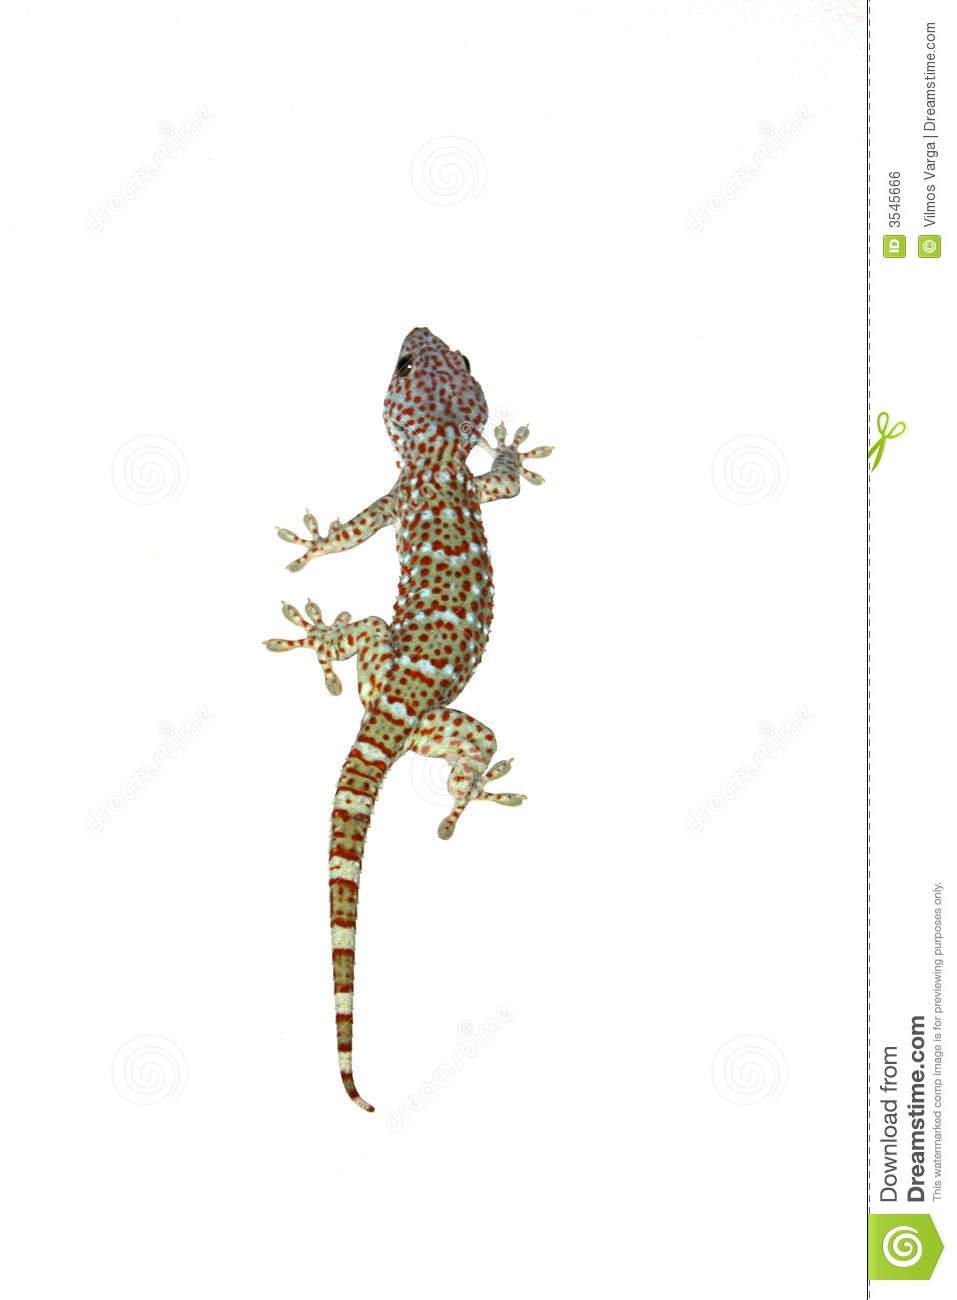 Tokay Gecko clipart #13, Download drawings